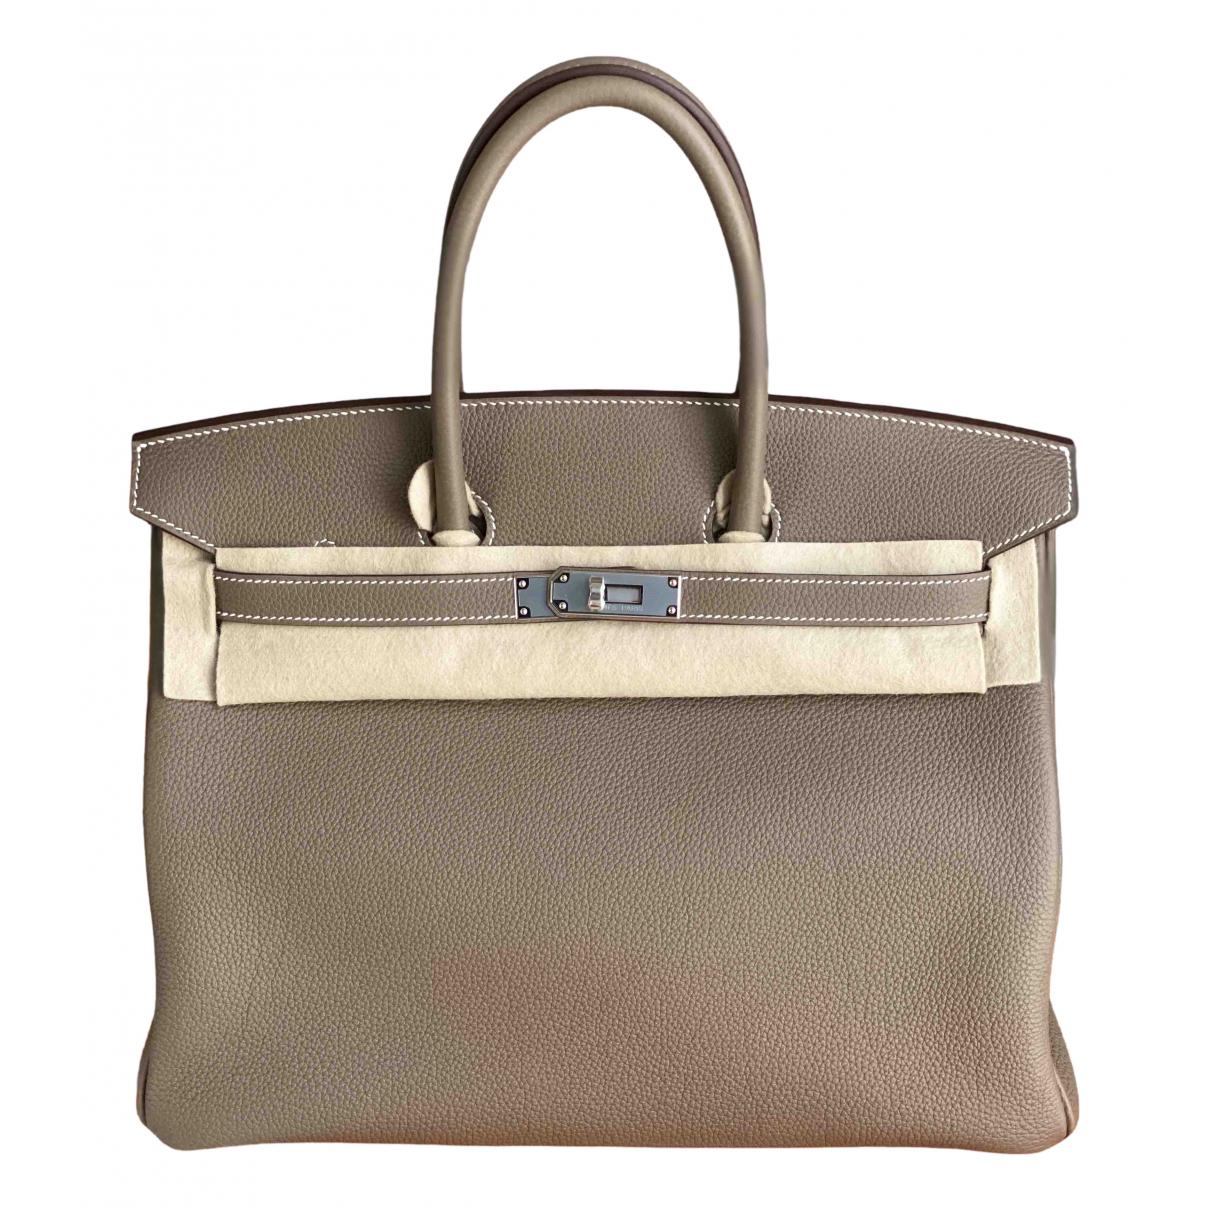 Hermes - Sac a main Birkin 35 pour femme en cuir - beige